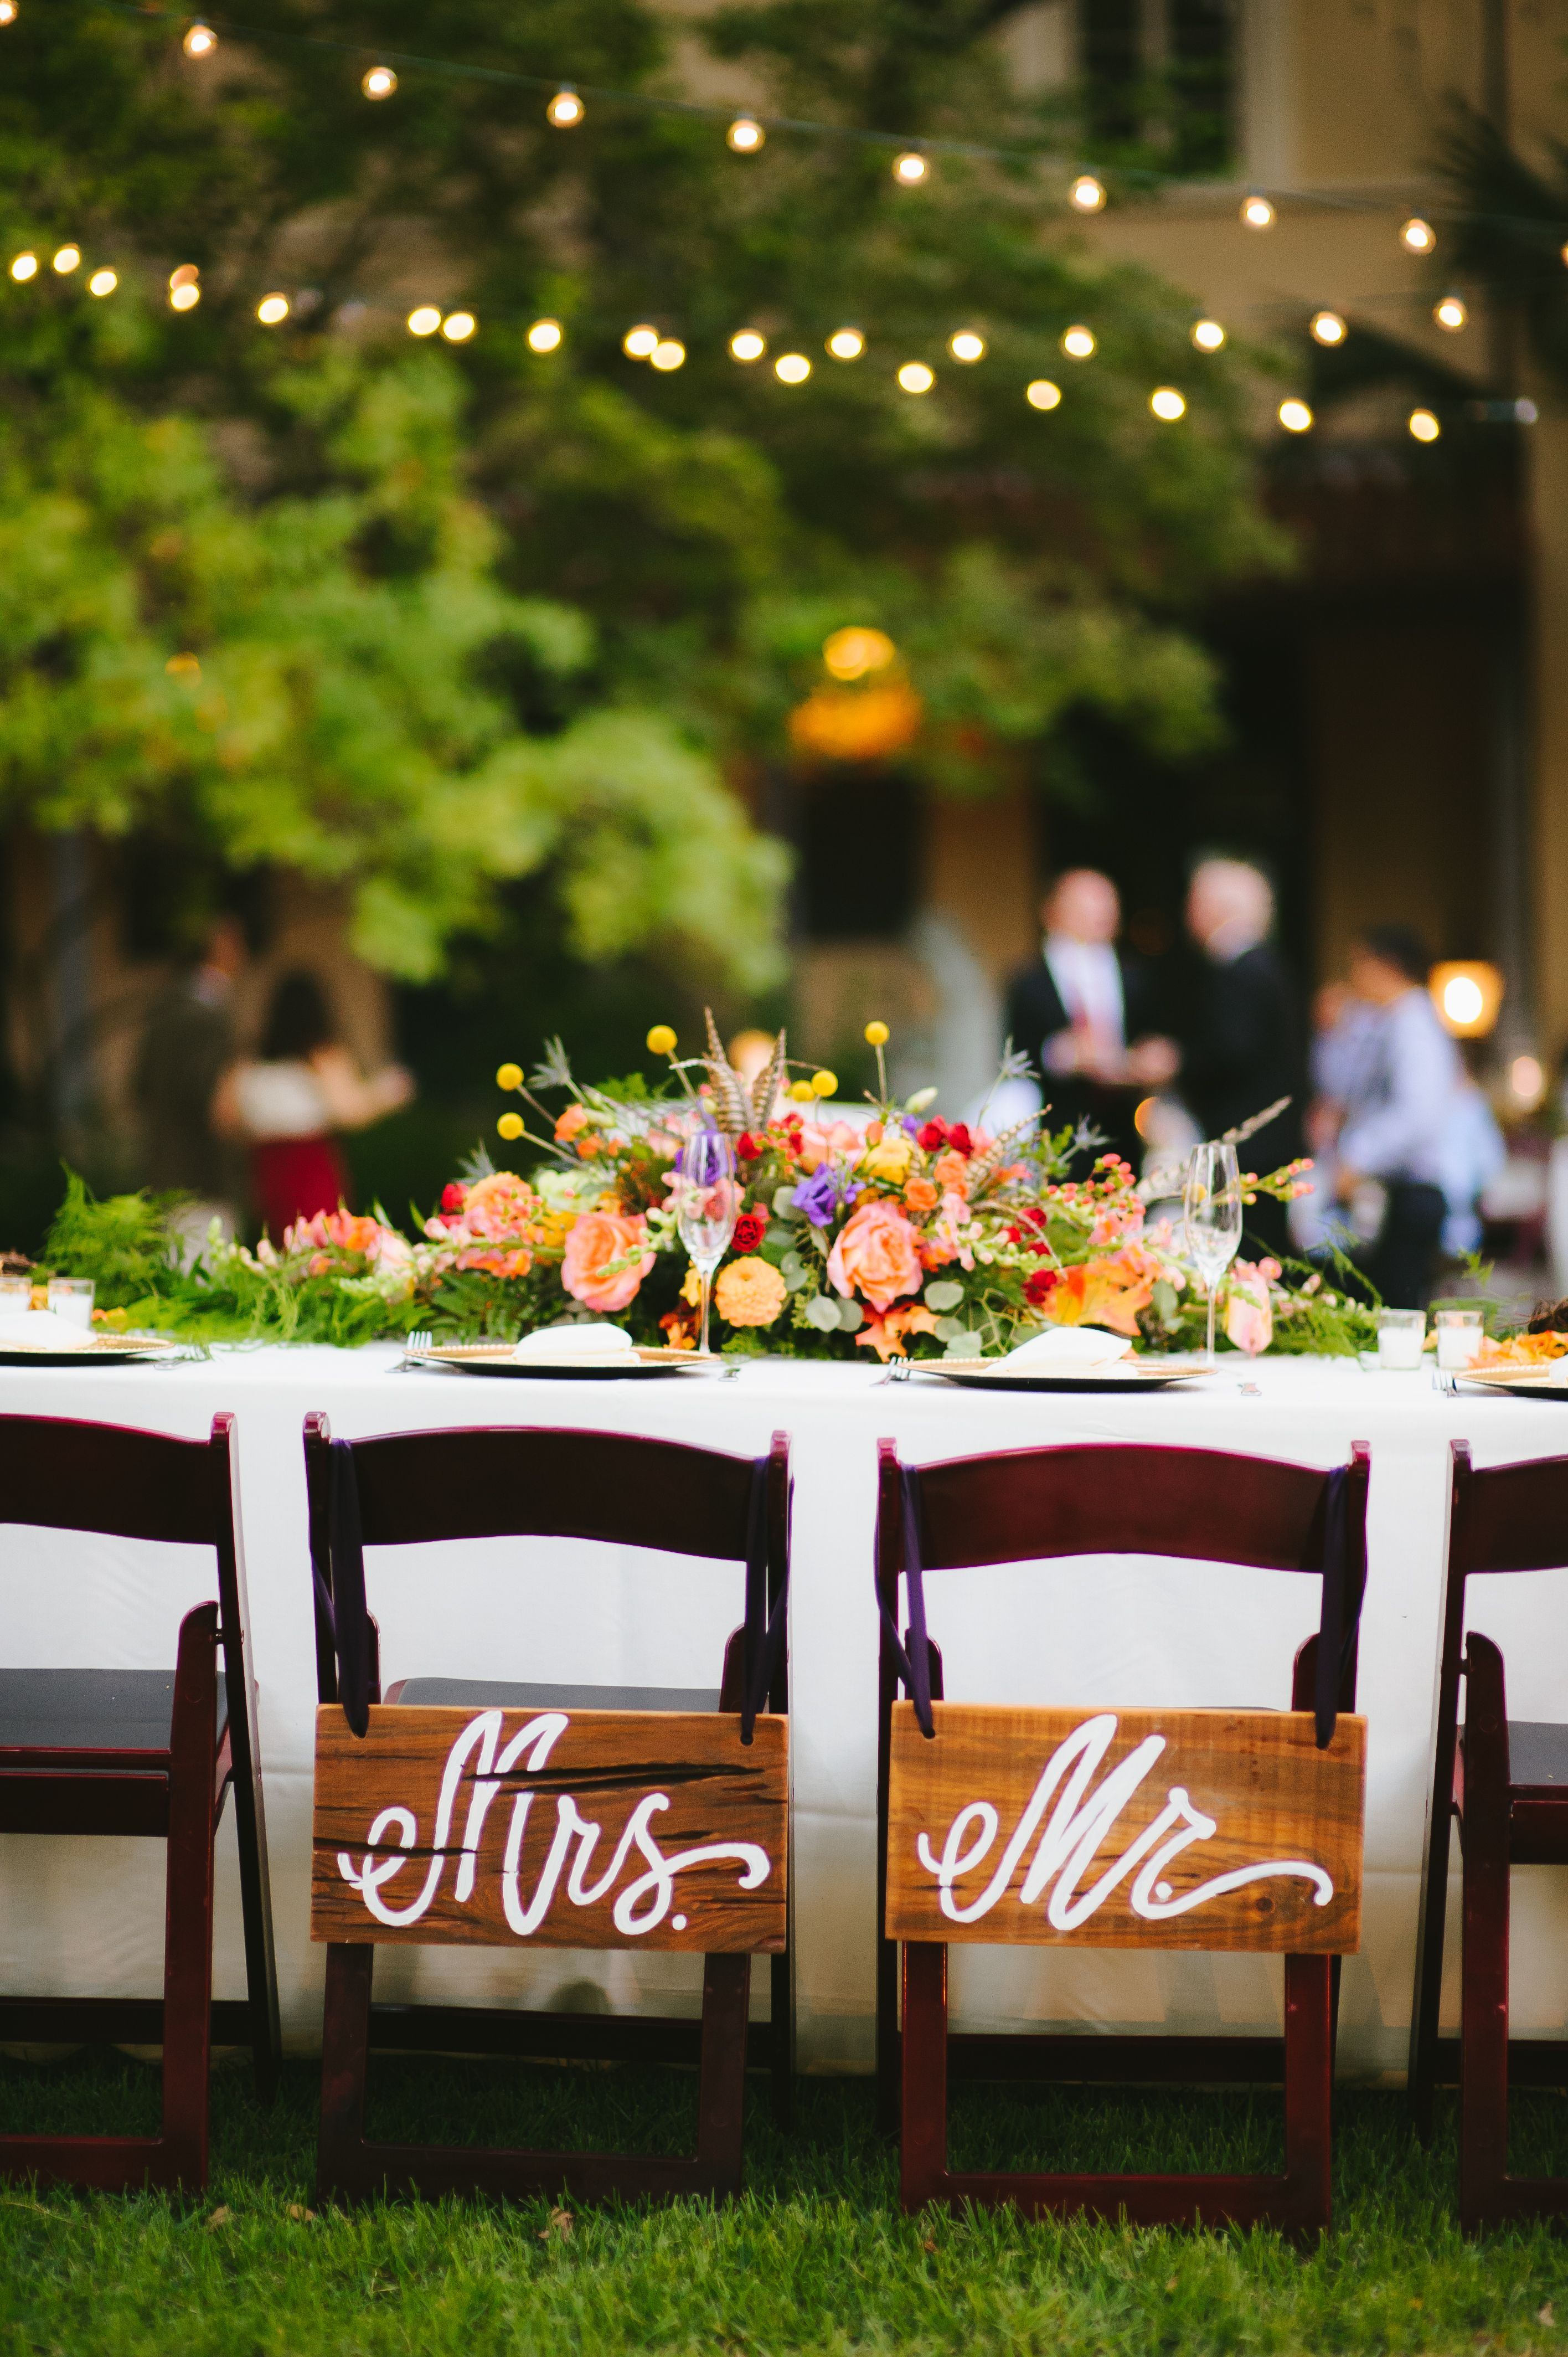 Mr Mrs Outdoor Texas Wedding Event Design Event Decor Event Rentals San Antonio Texas Photography Tent Rentals Event Design Wedding